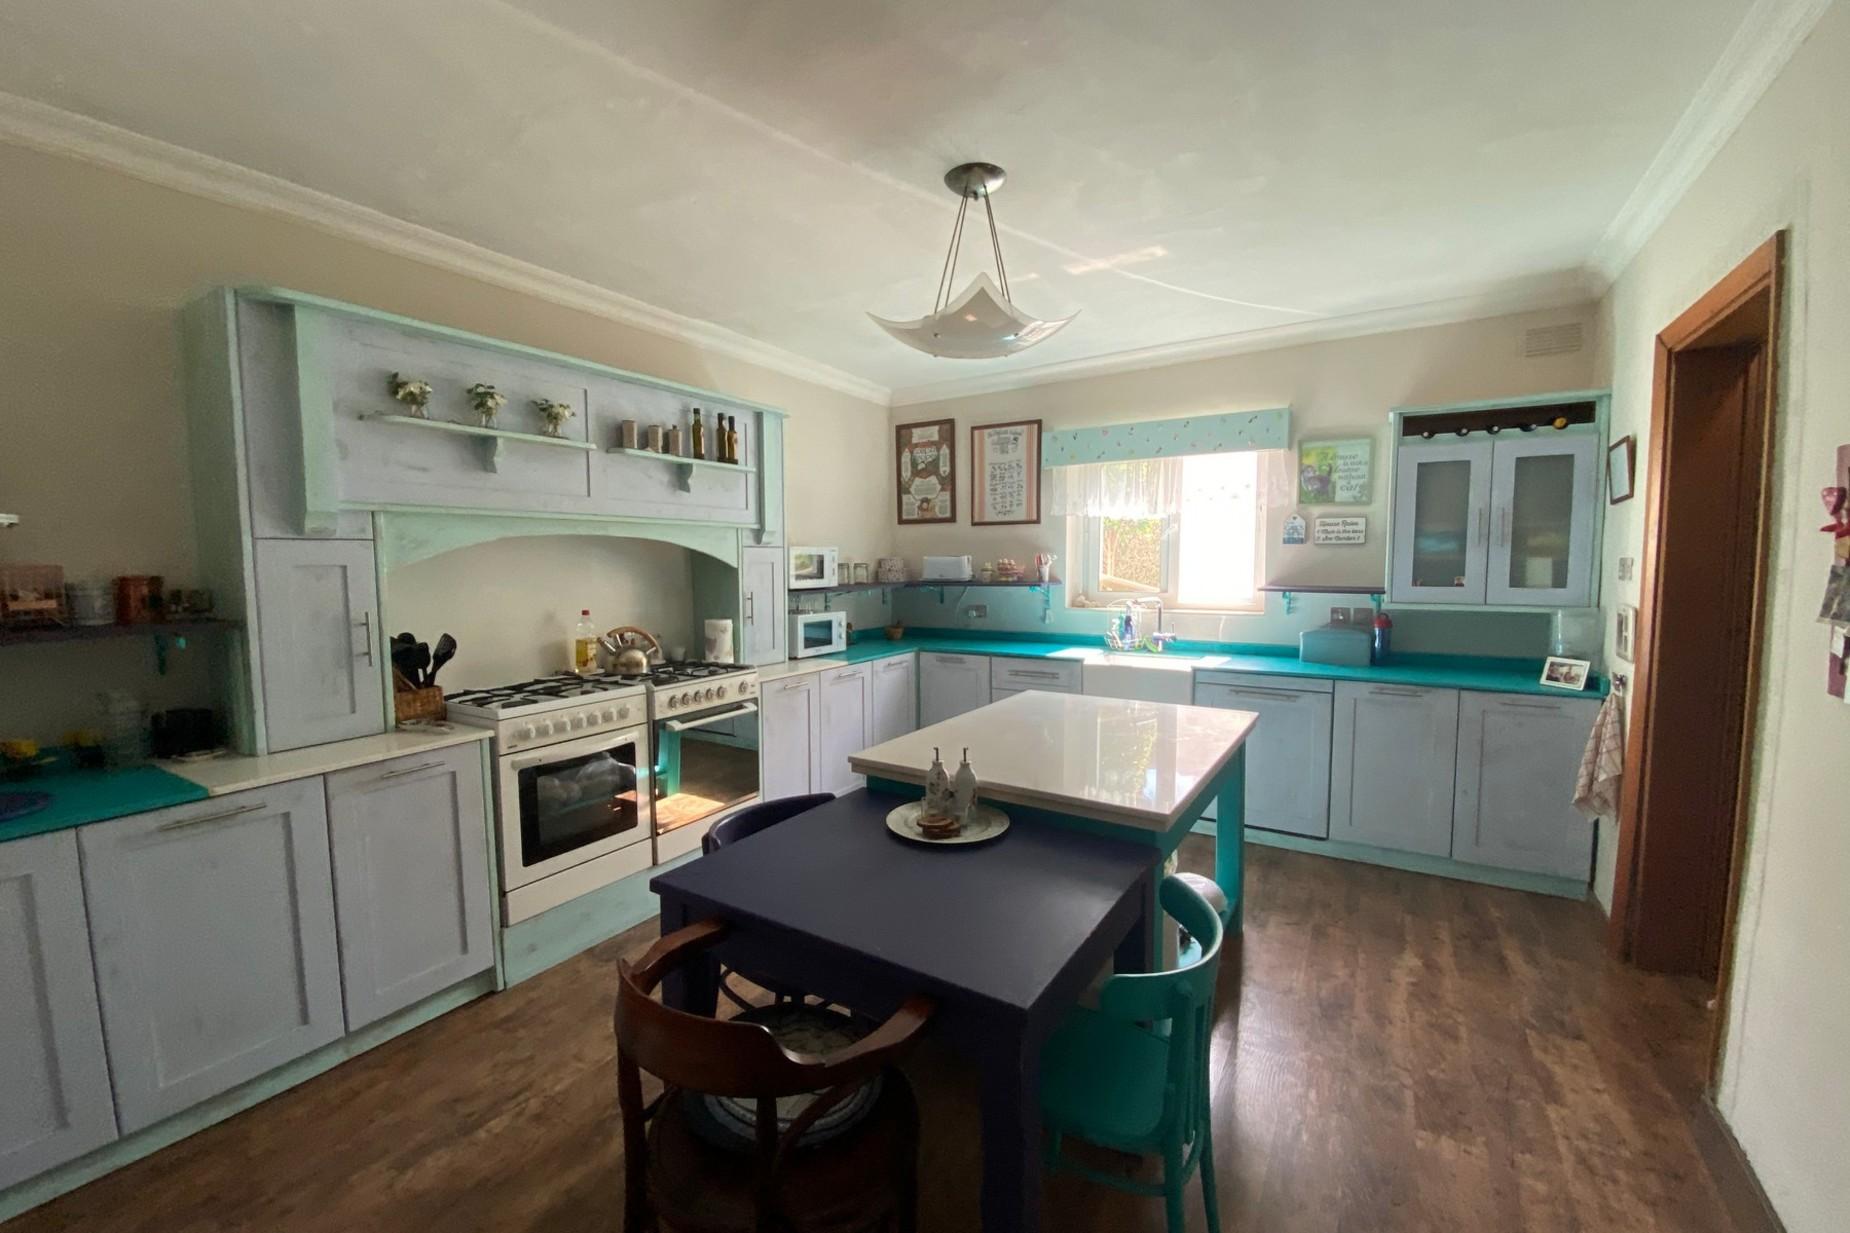 3 bed Villa For Sale in Santa Venera, Santa Venera - thumb 11